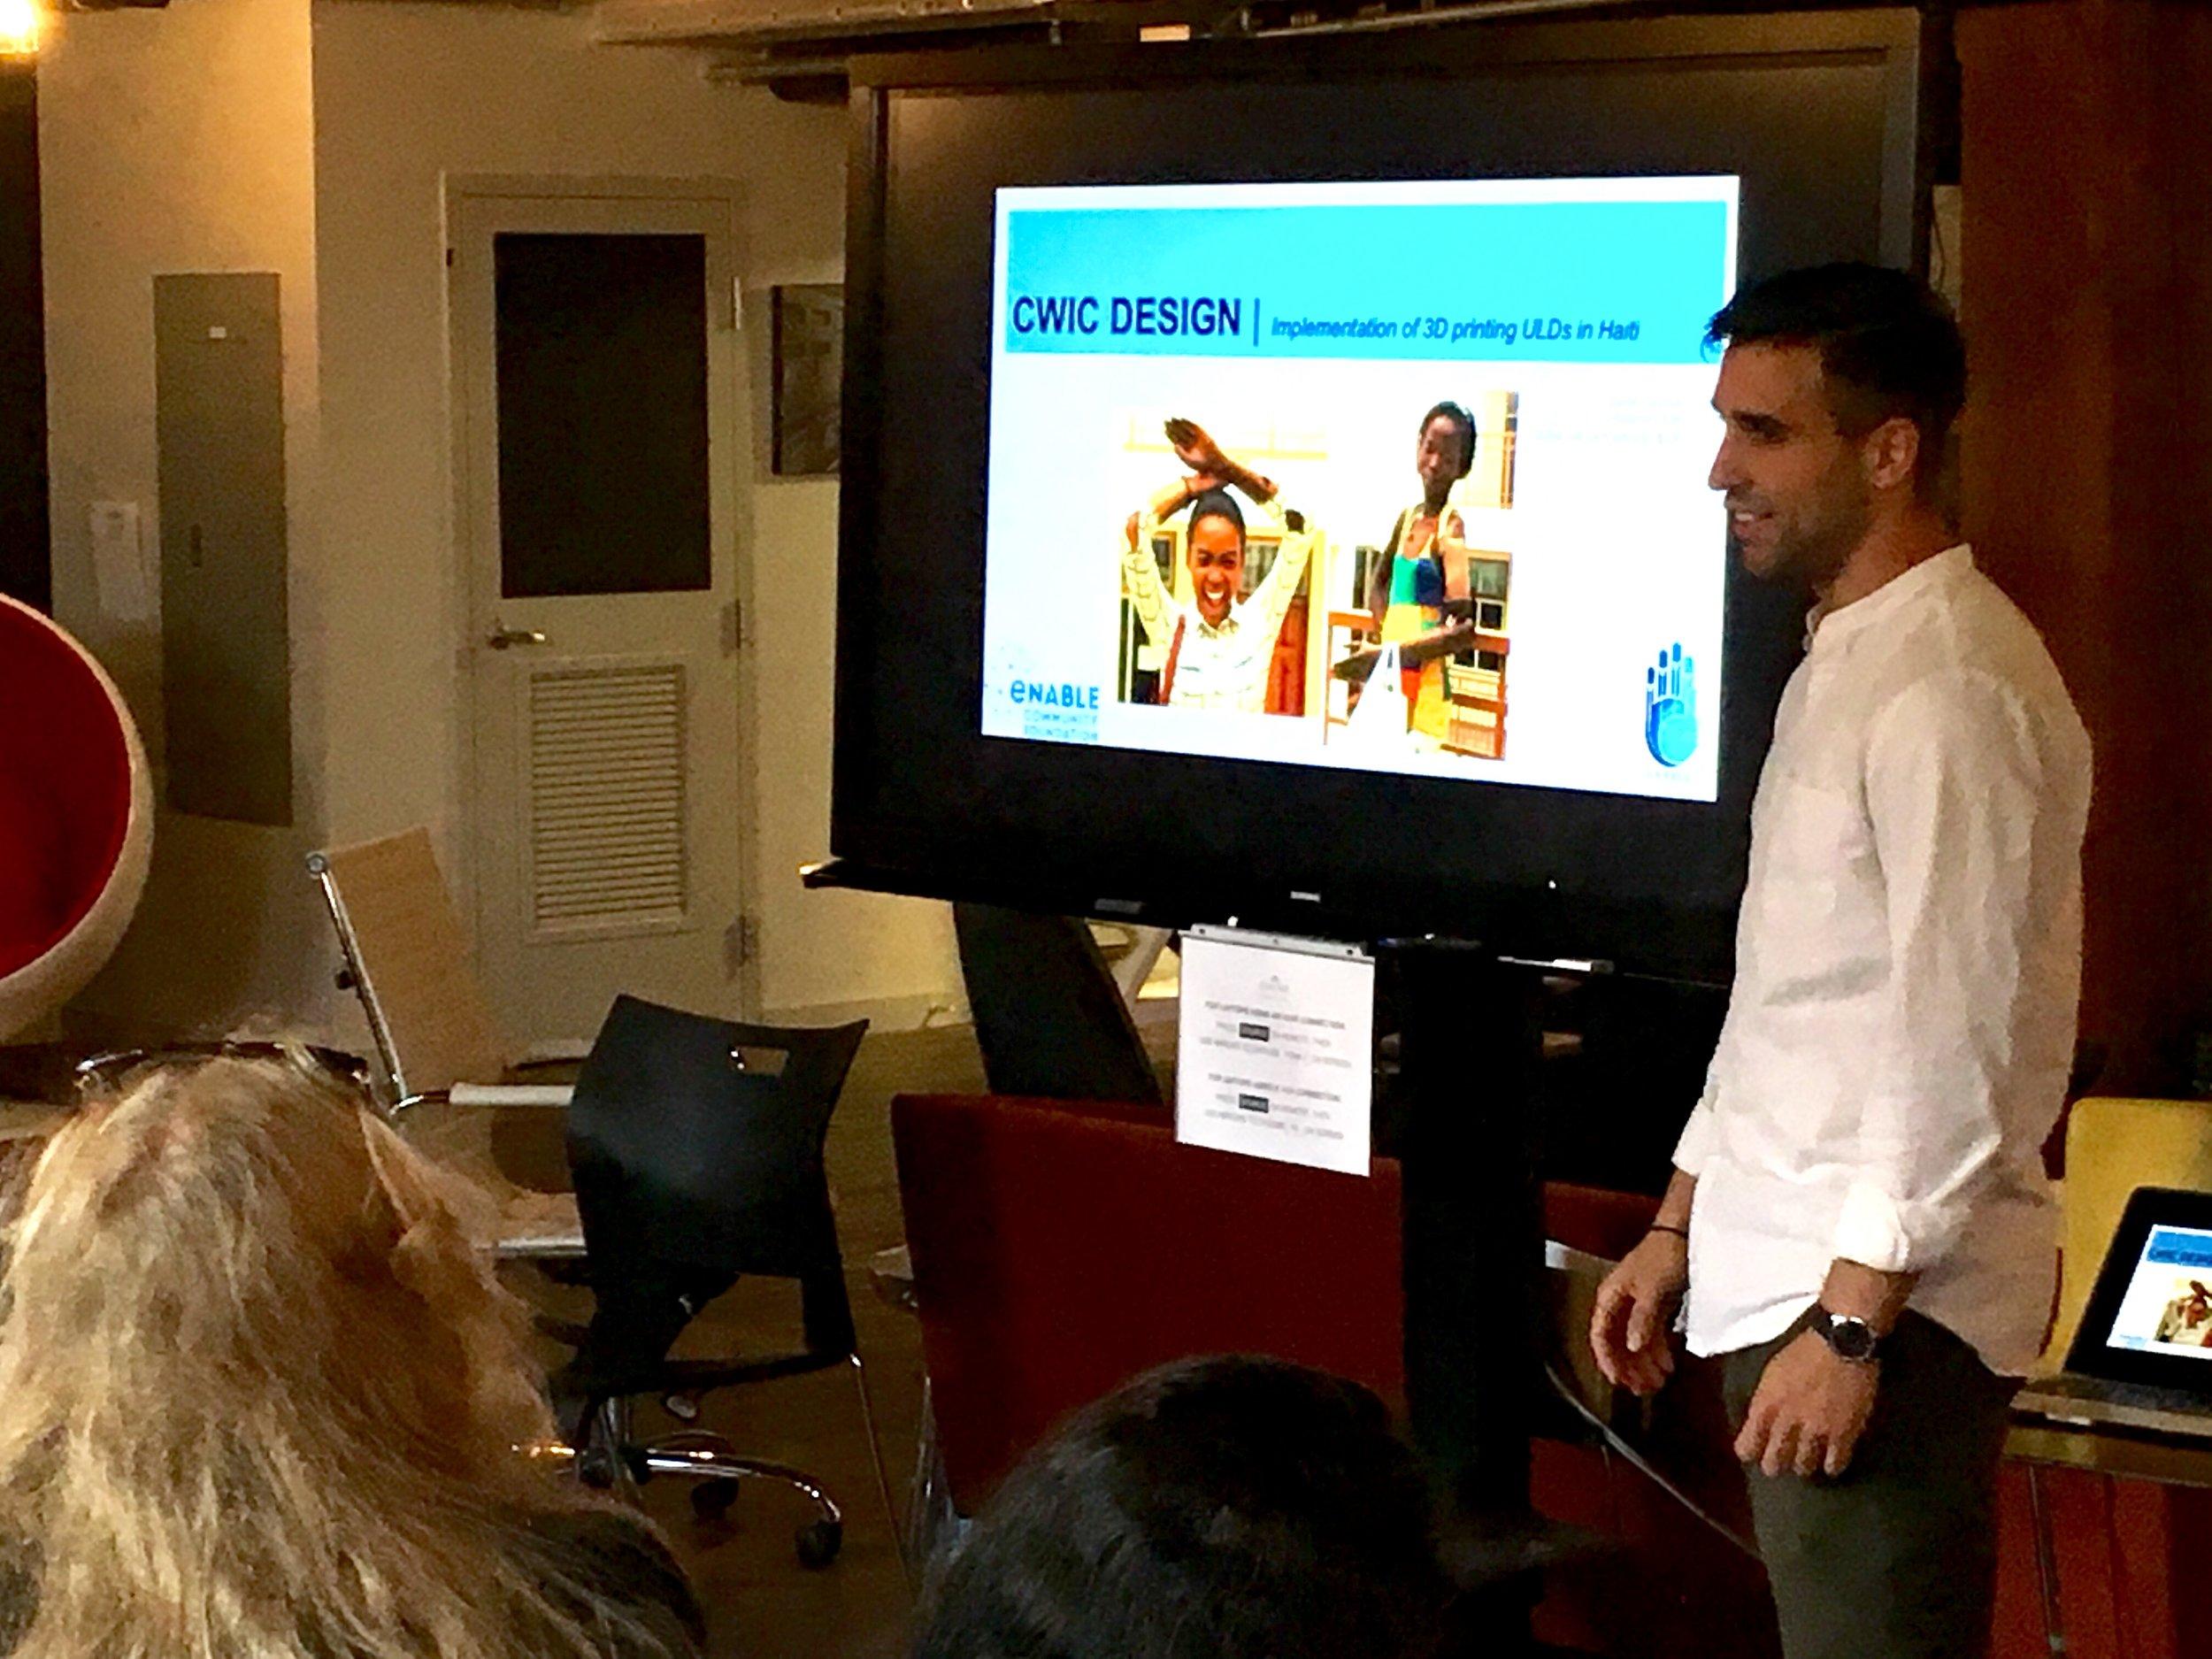 Dante Varotsis describes his experience implementing a 3D printed prosthetics program in Haiti